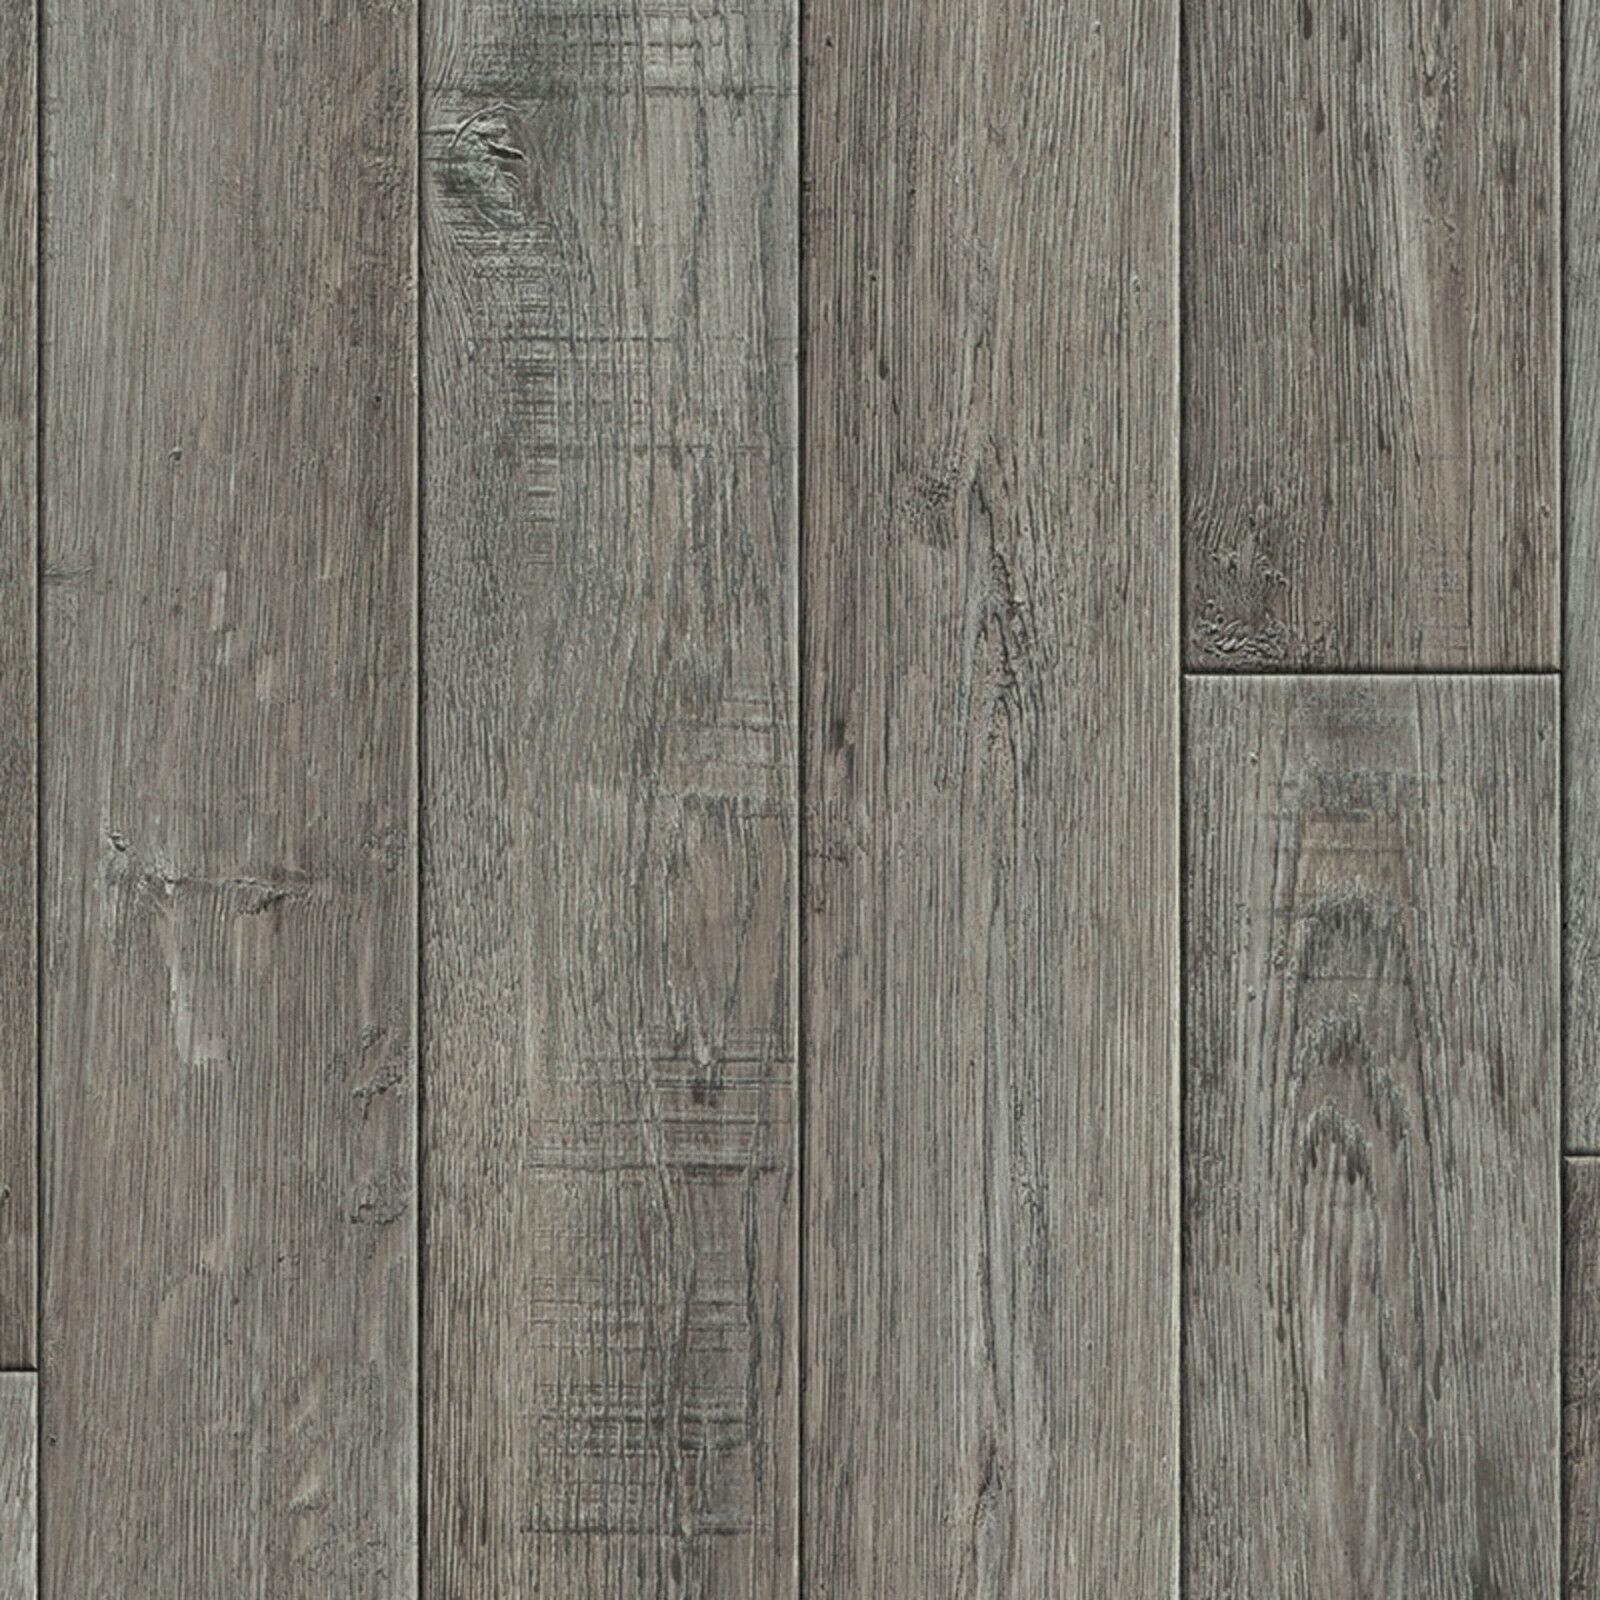 PVC Vinyl Bodenbelag Tarkett Exclusive 260 Rustic Oak Dark grau Breite 400 cm